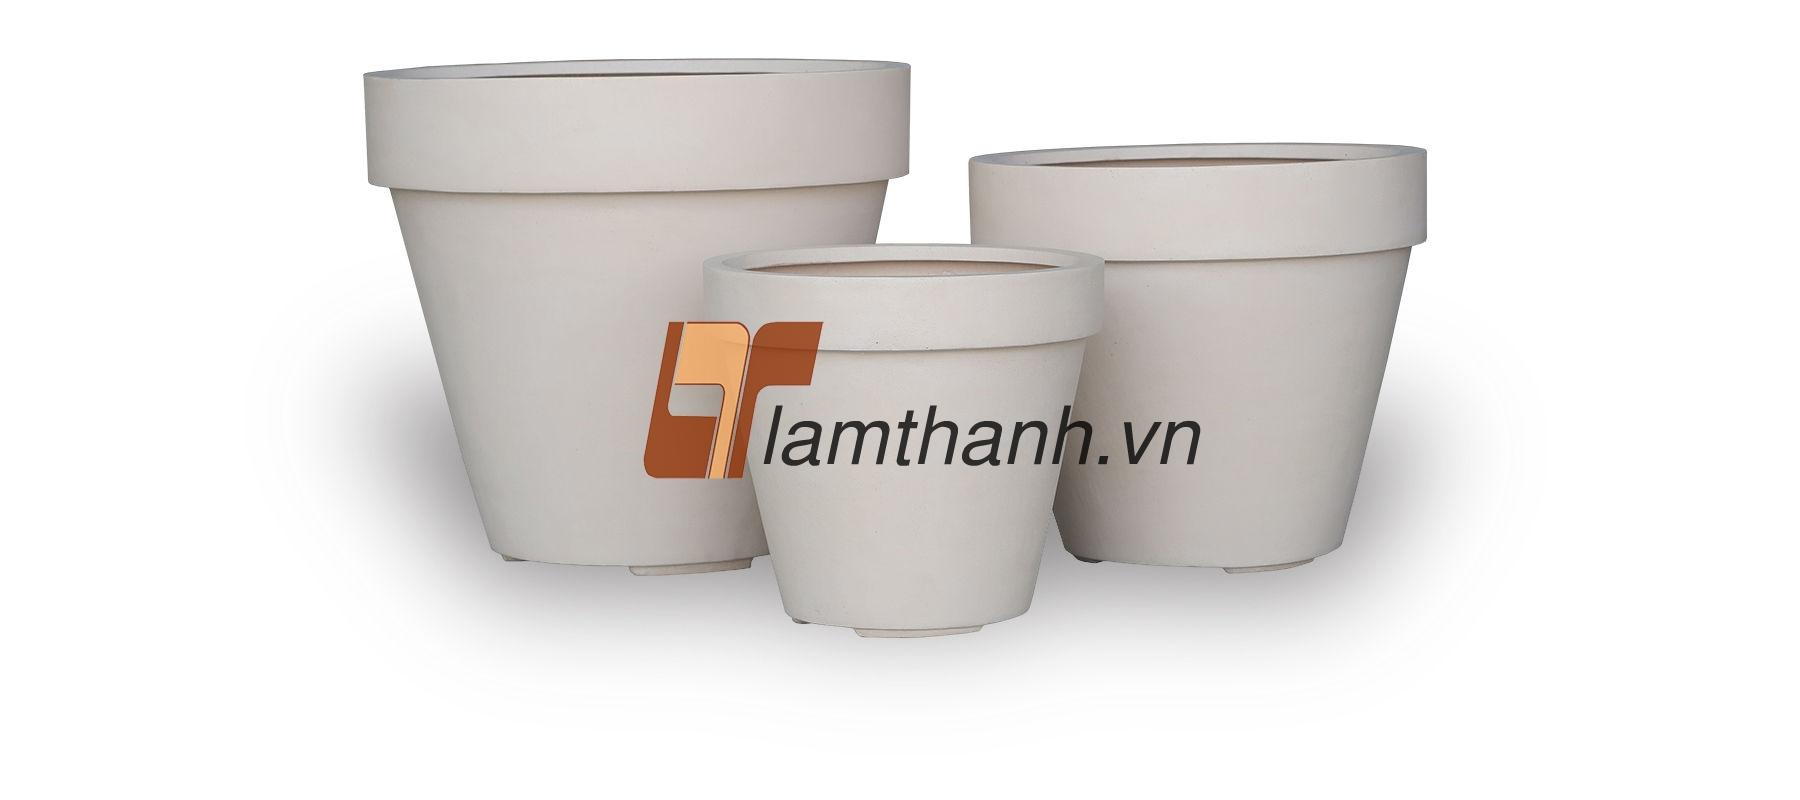 vietnam polystone, fiberstone 06